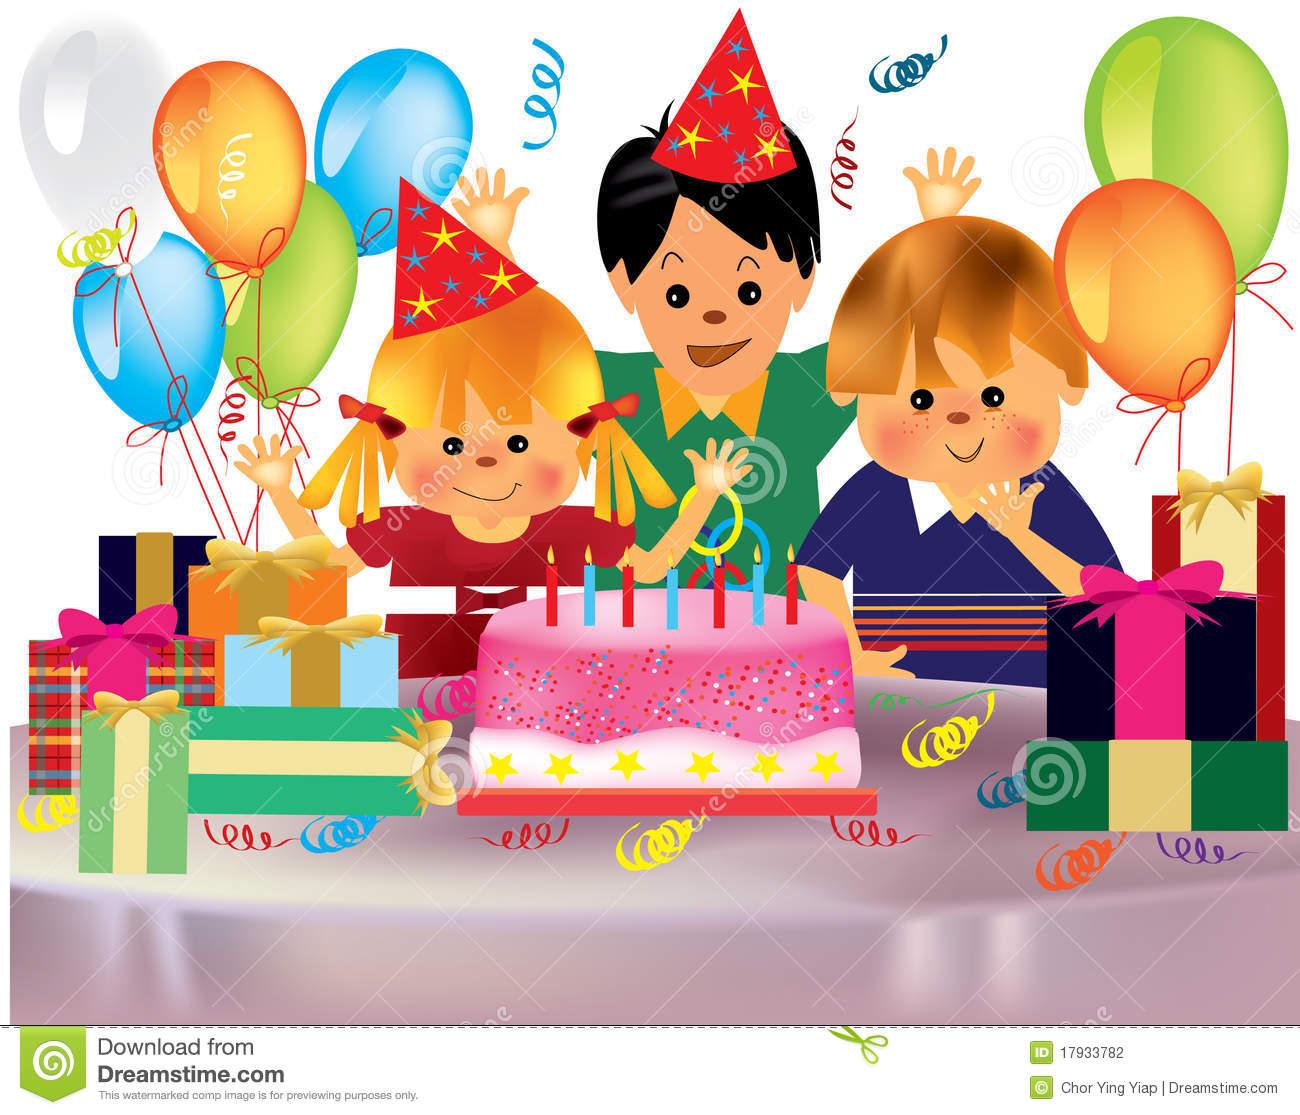 Celebration clipart birthday celebration. Party scene